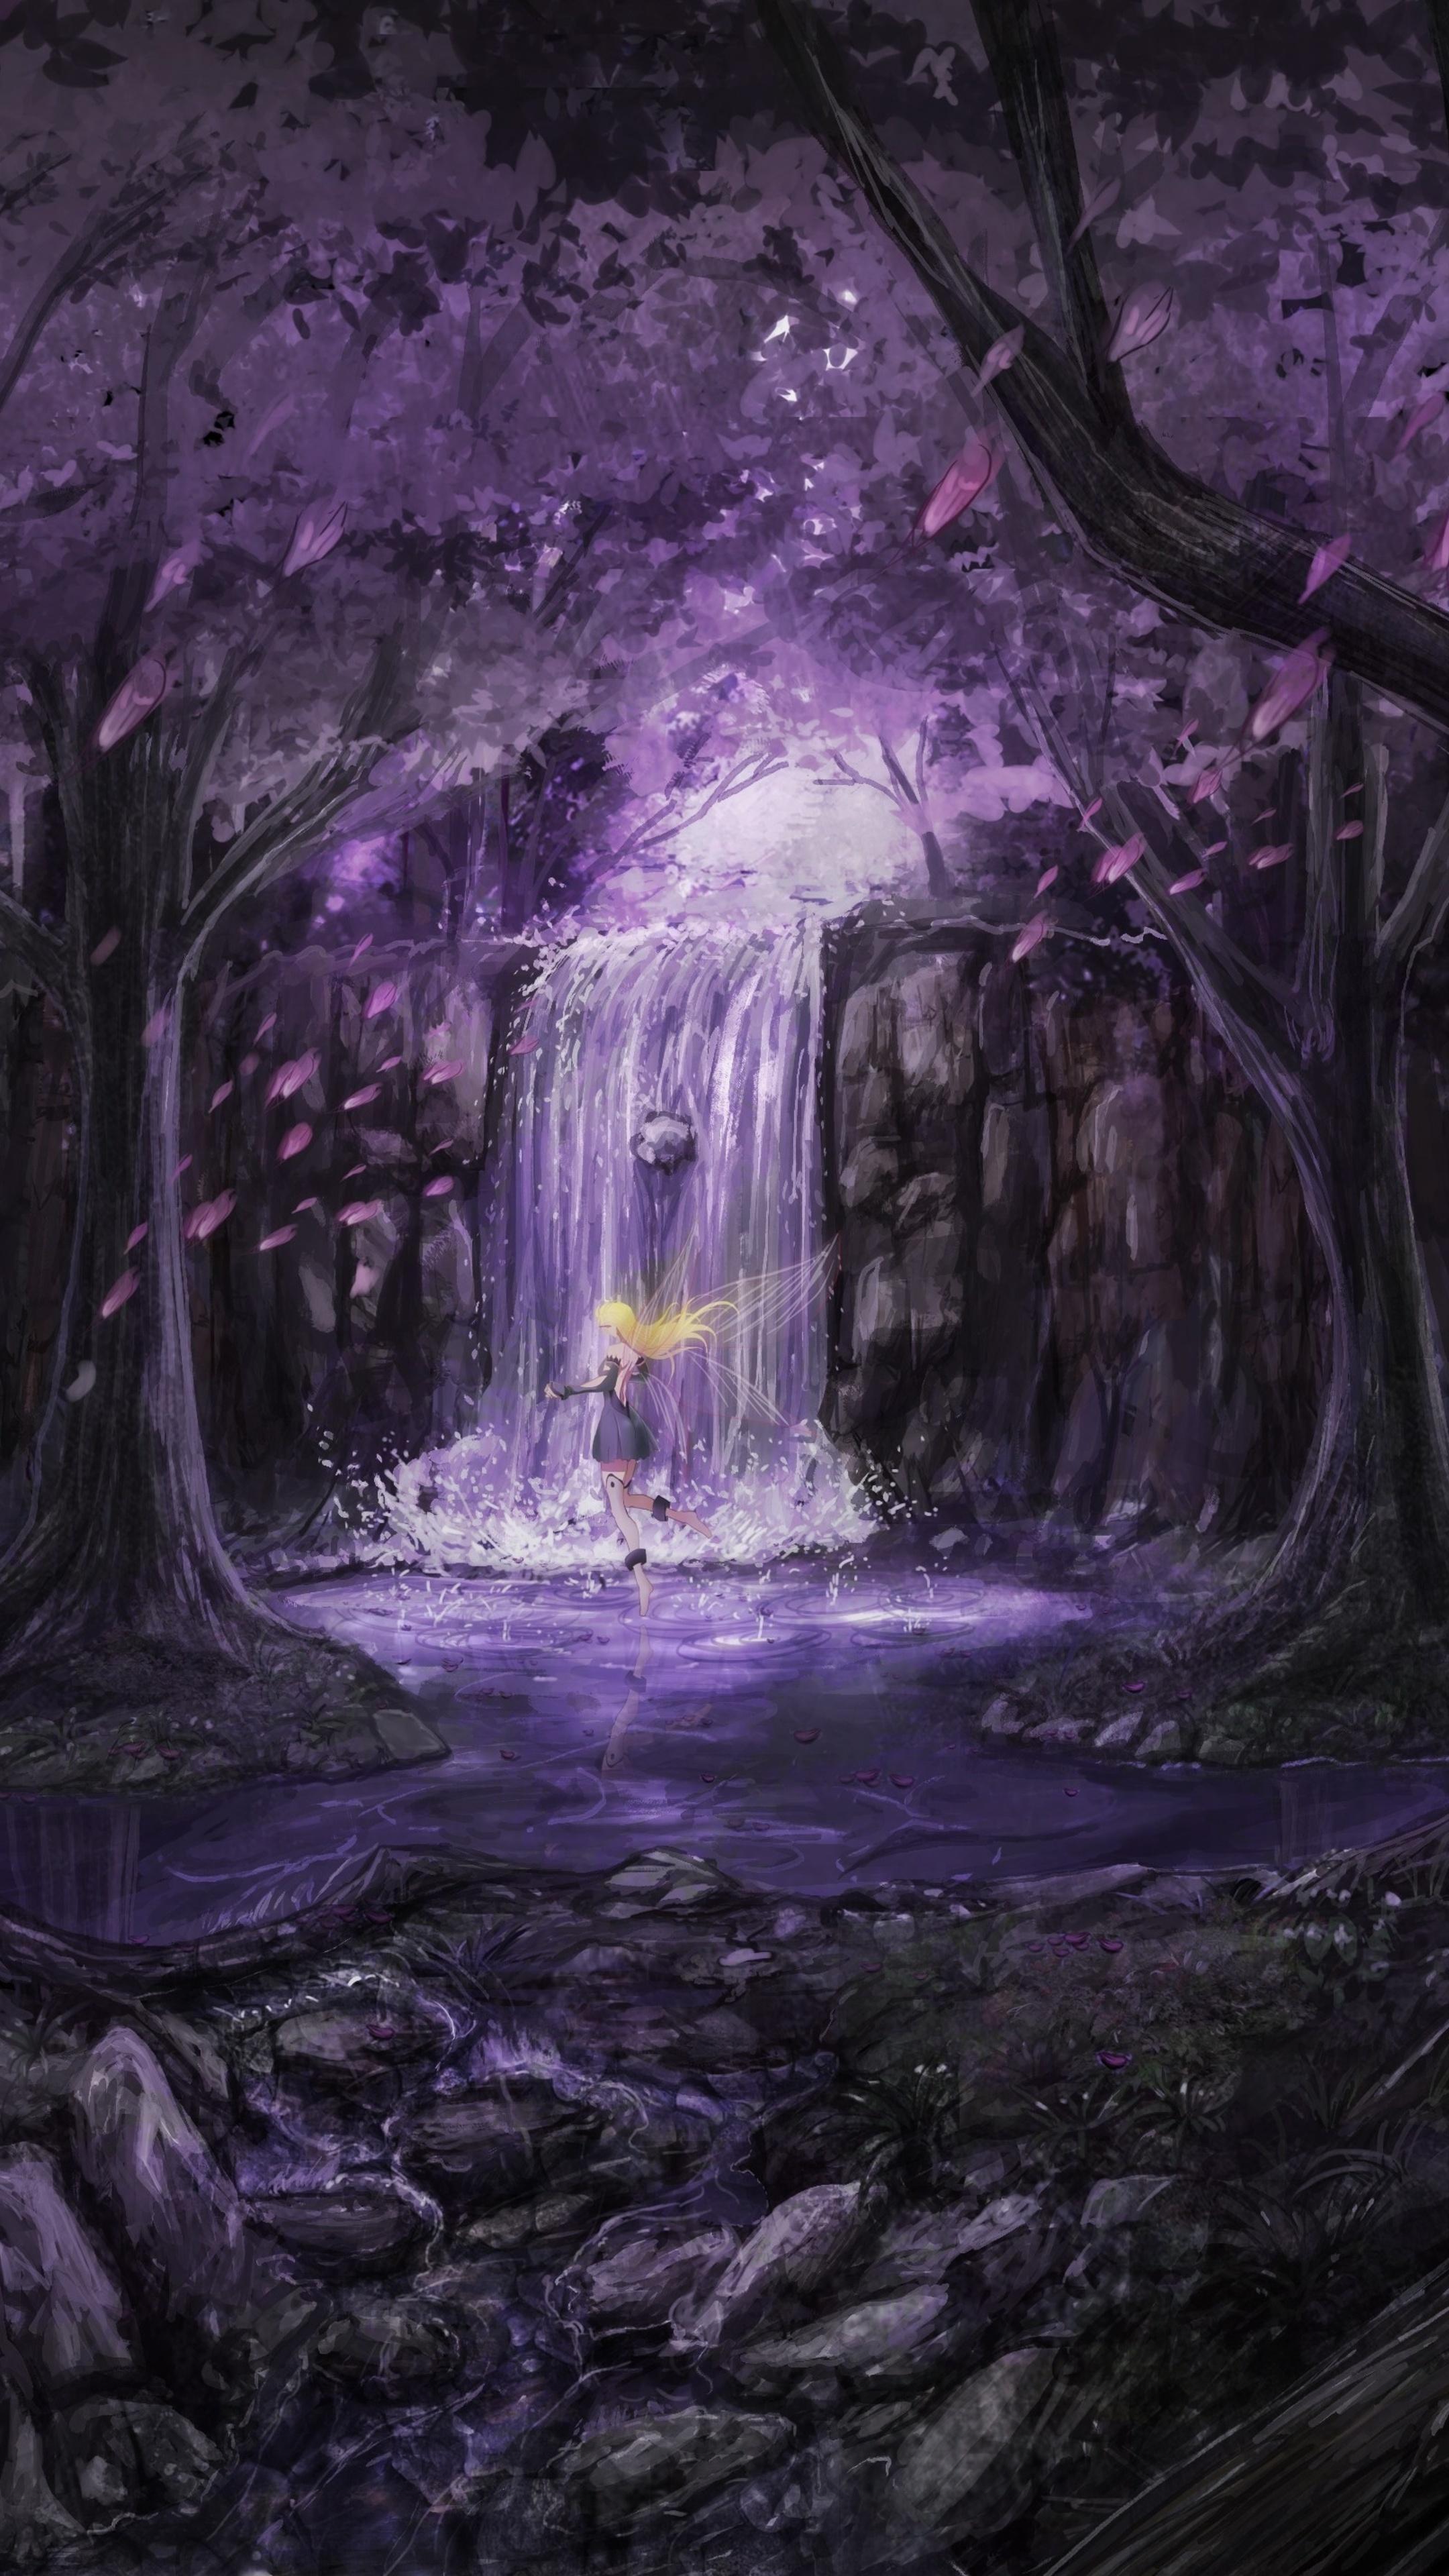 2160x3840 anime landscape trees dress fairies 5k sony - Art wallpaper 2160x3840 ...